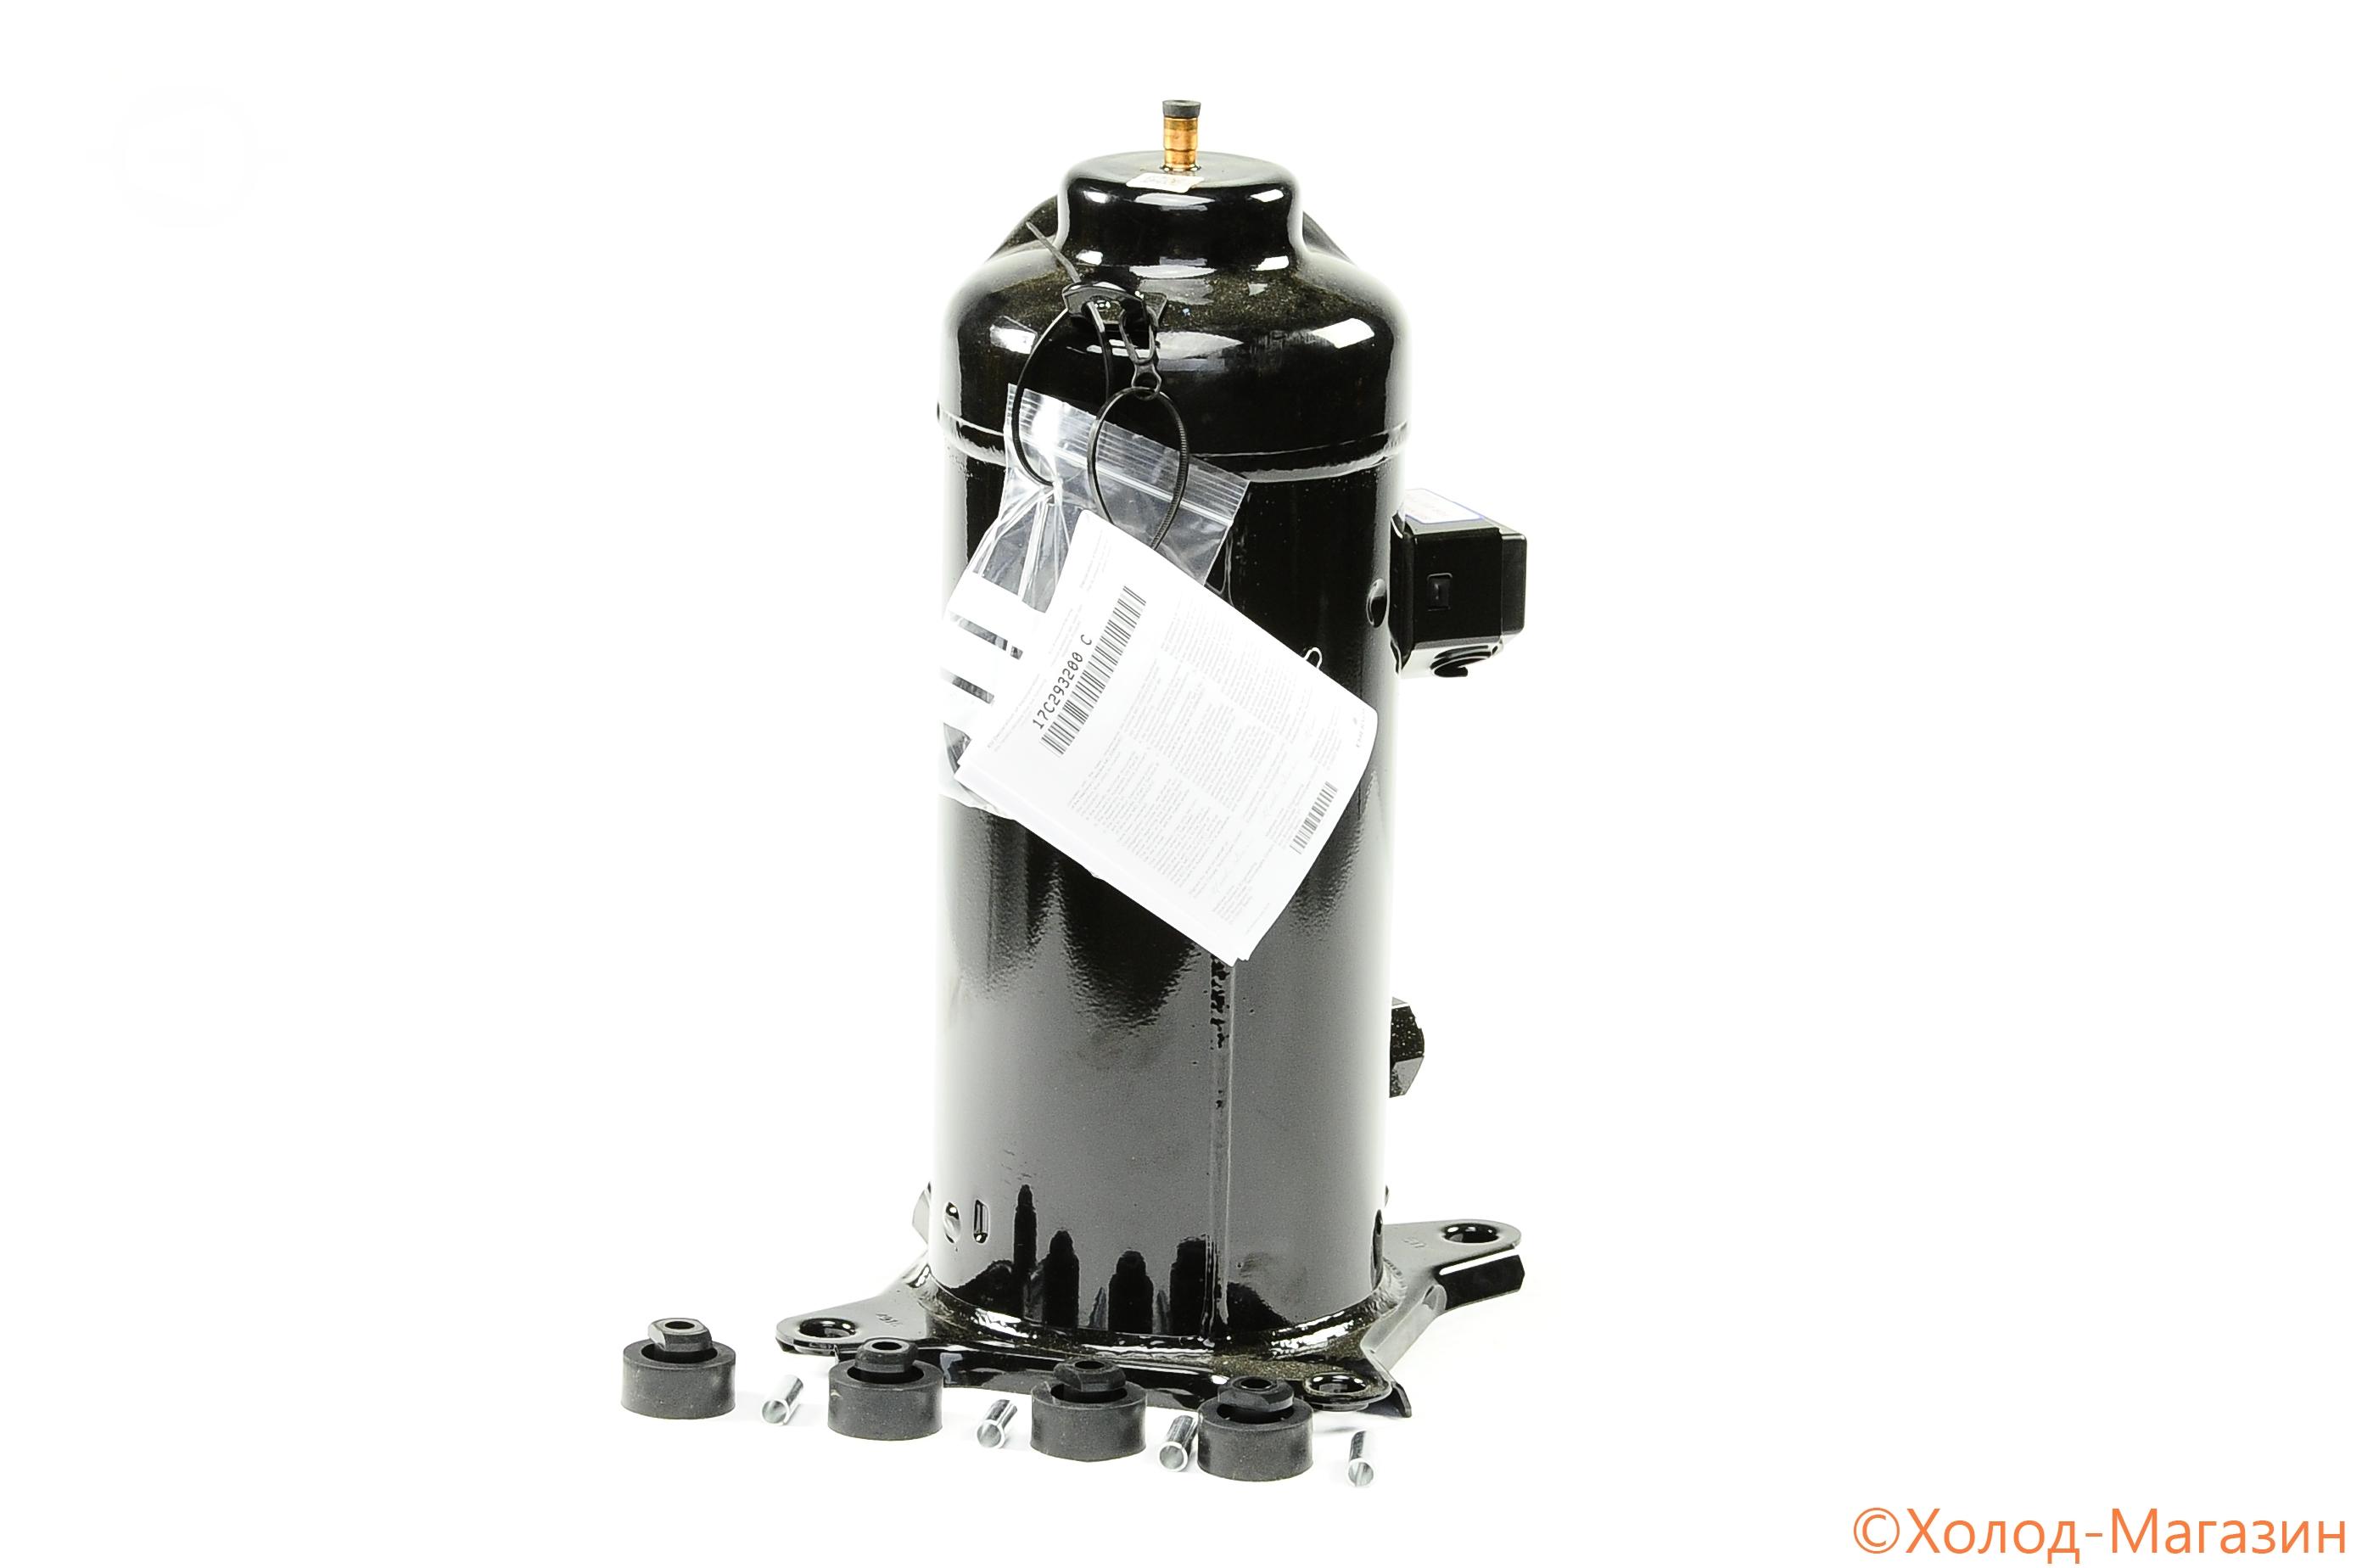 Компрессор спиральный ZBD 21 KCE-TFD-551 Copeland, Emerson